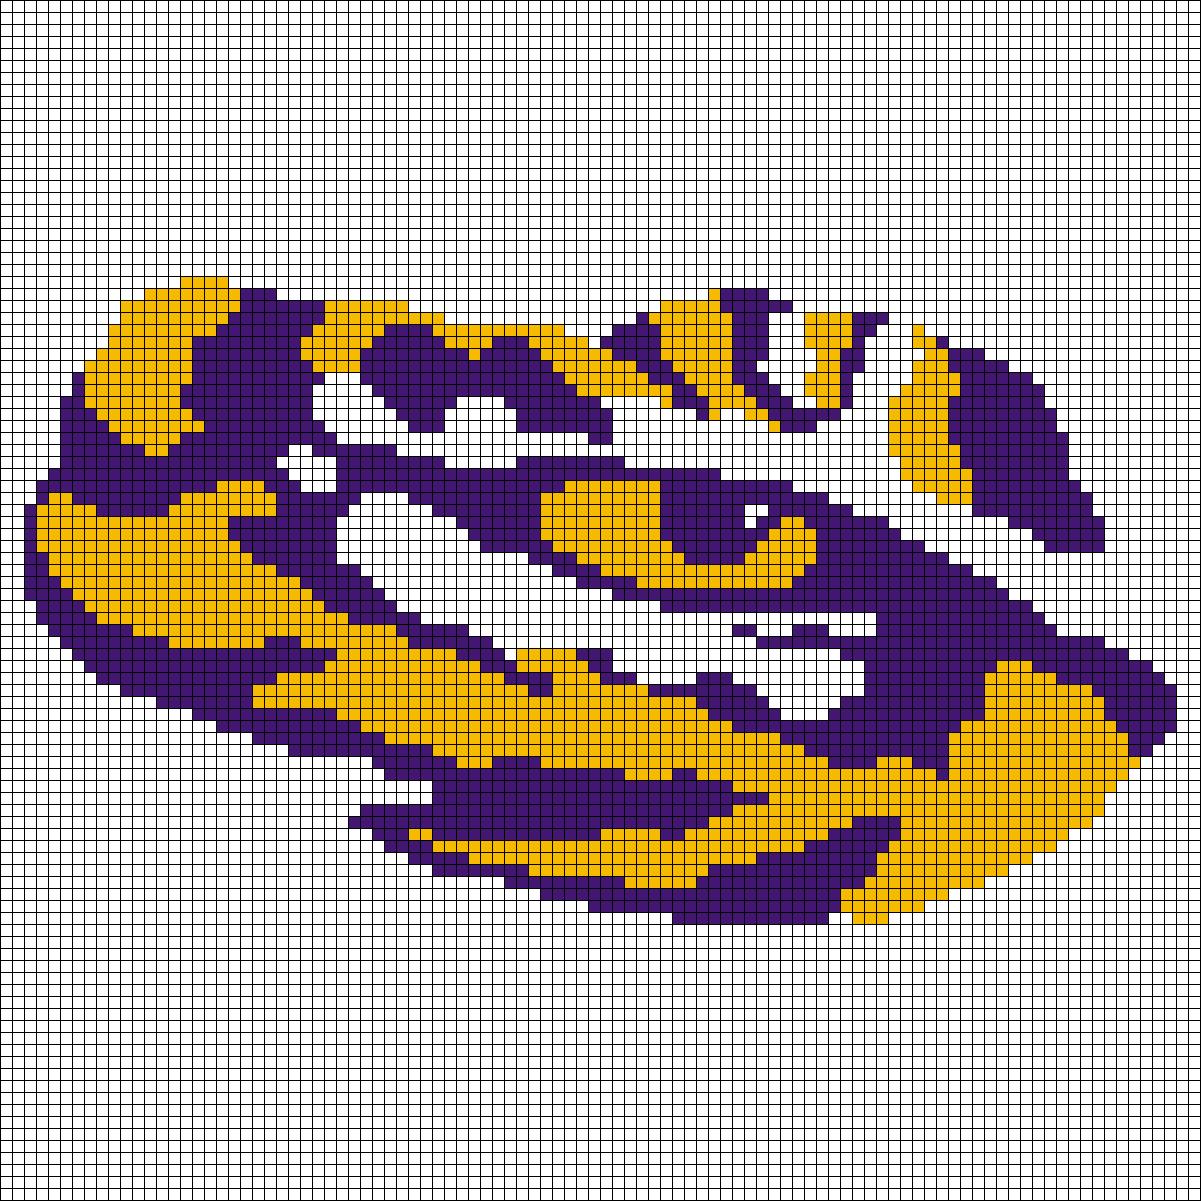 Can someone build a lsu cross stitch pattern grid for me can someone build a lsu cross stitch pattern grid for me tigerdroppings fandeluxe Gallery